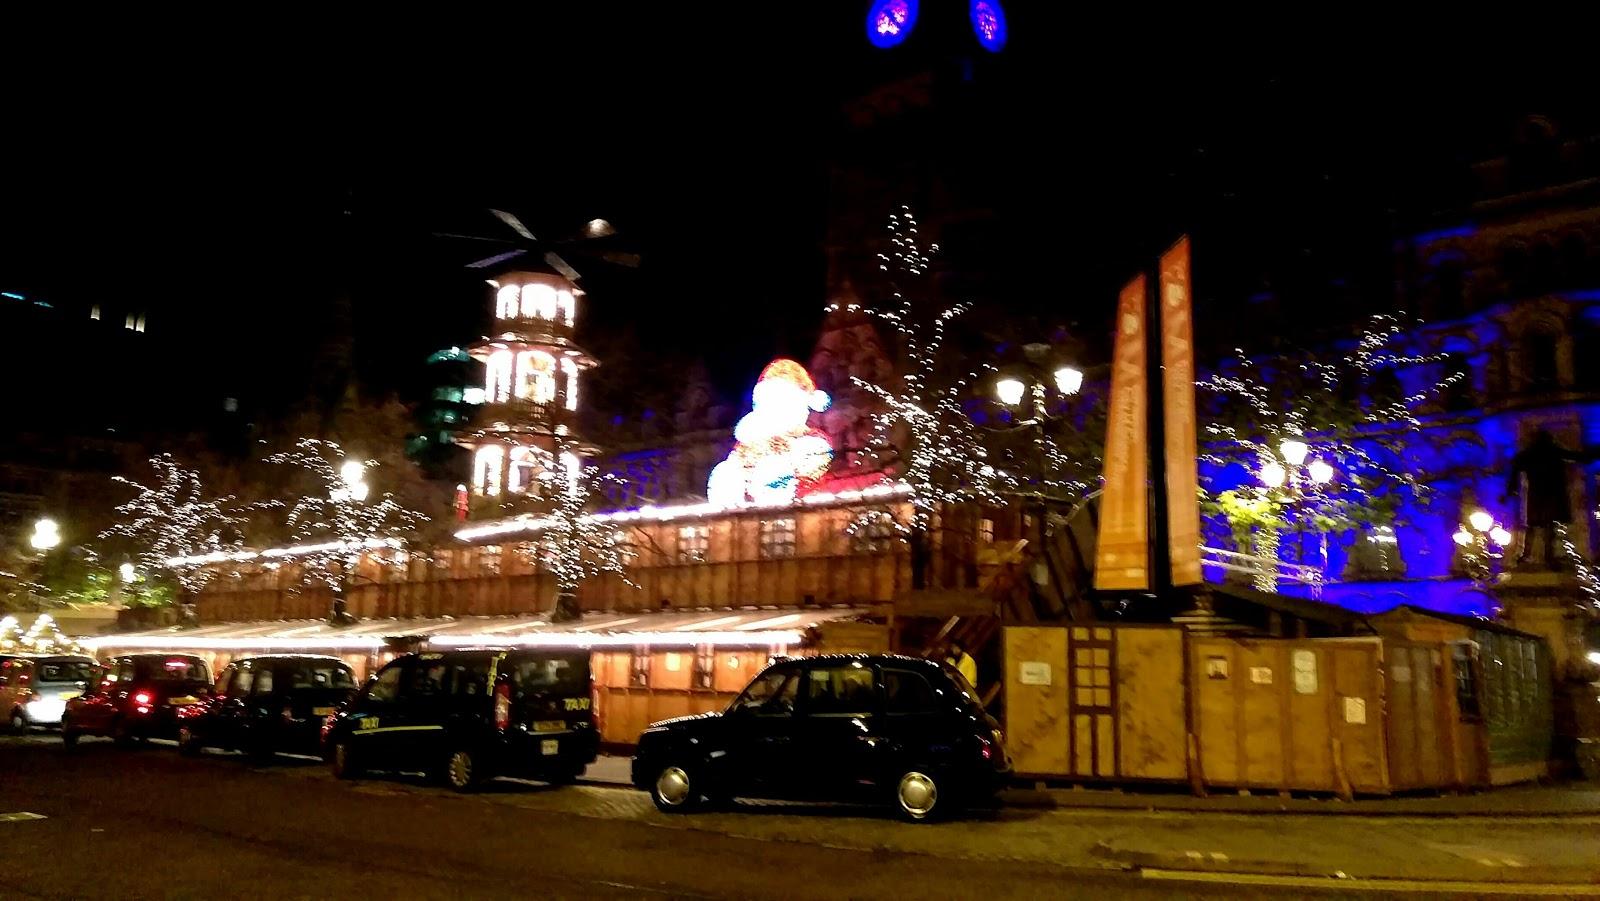 Bogoosha: Manchester Christmas Market 2015